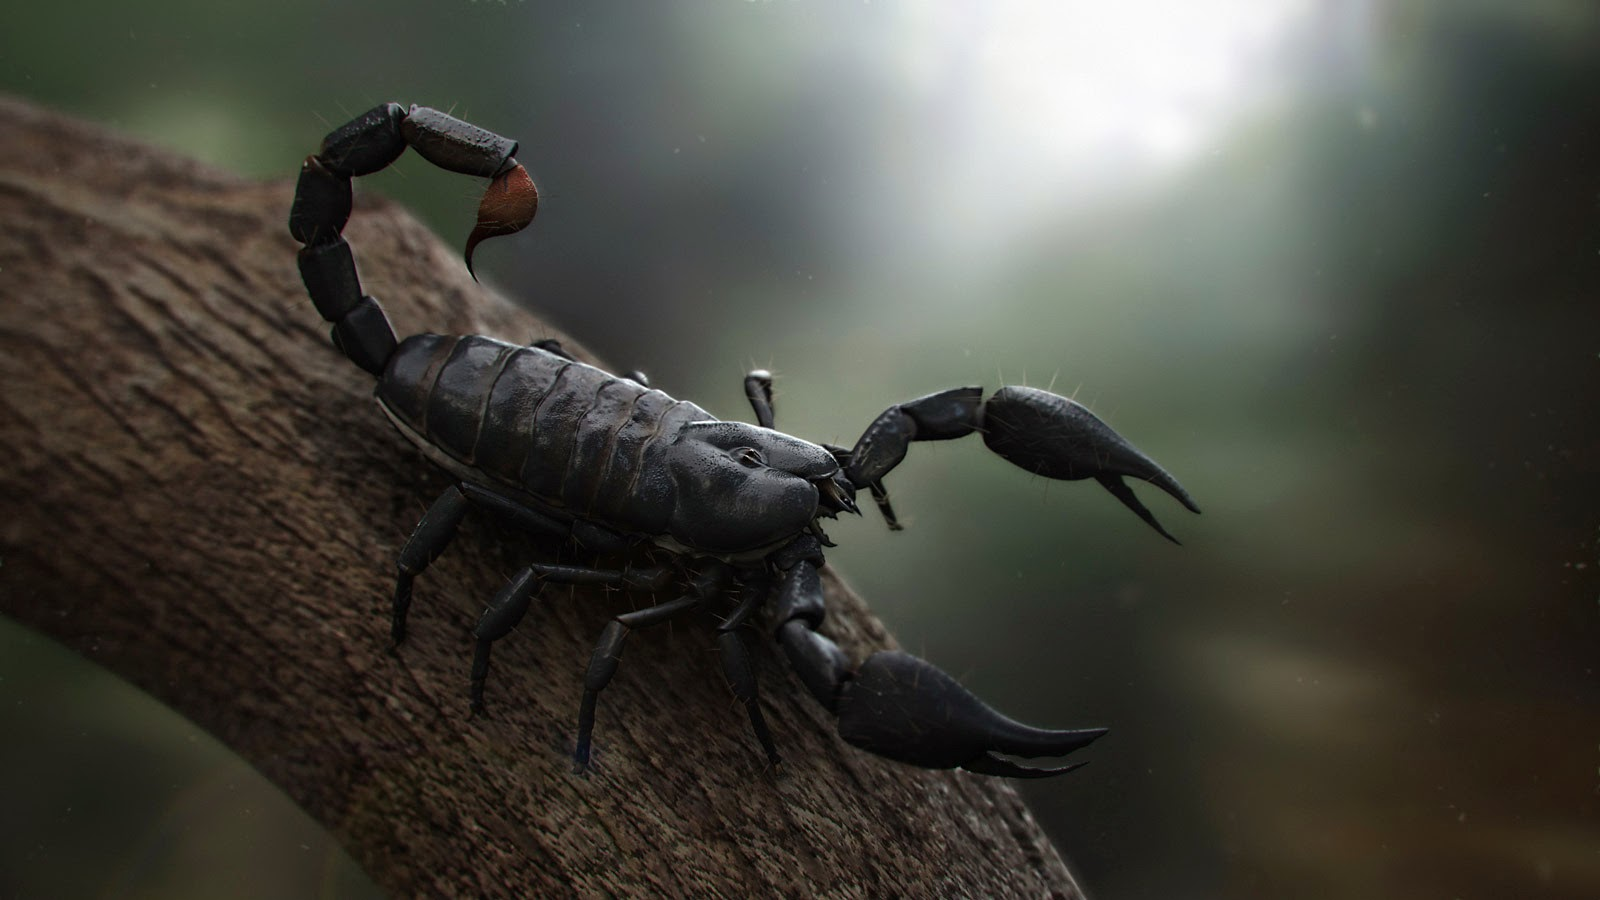 Black Scorpion HD Wallpapers   HD Wallpapers Blog 1600x900